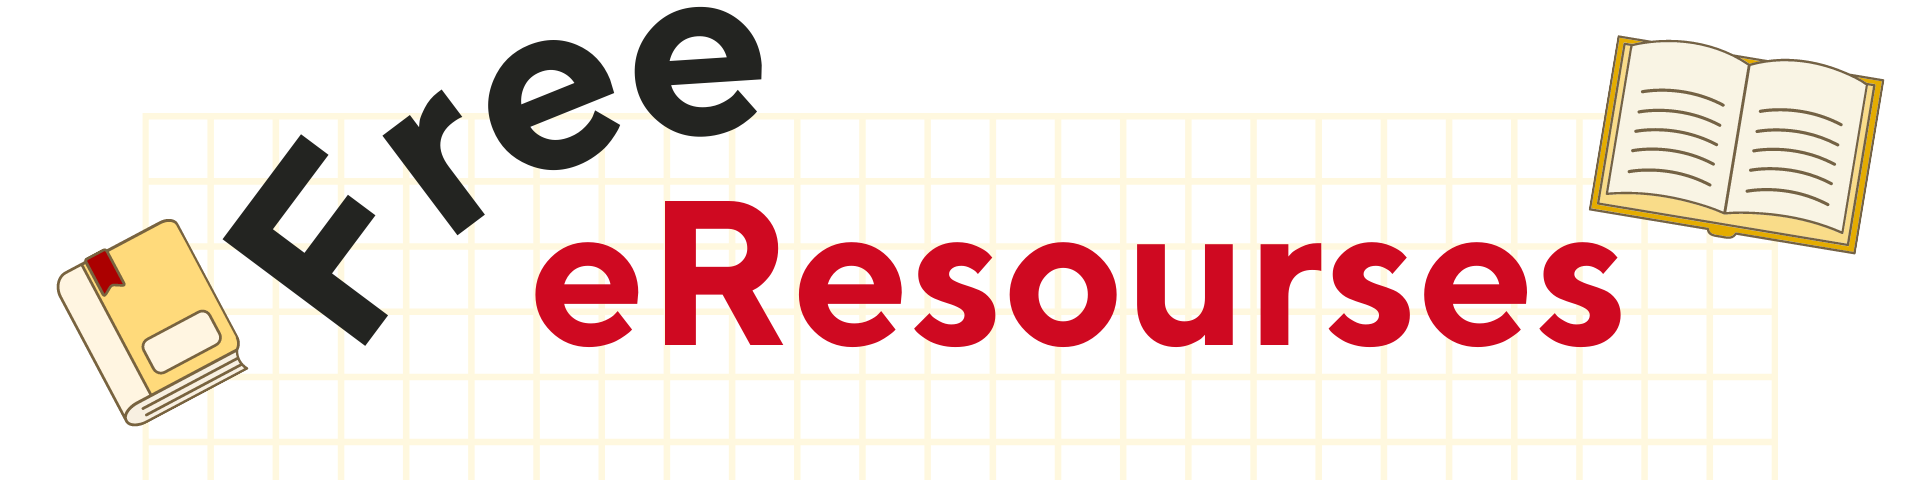 Free eResourses